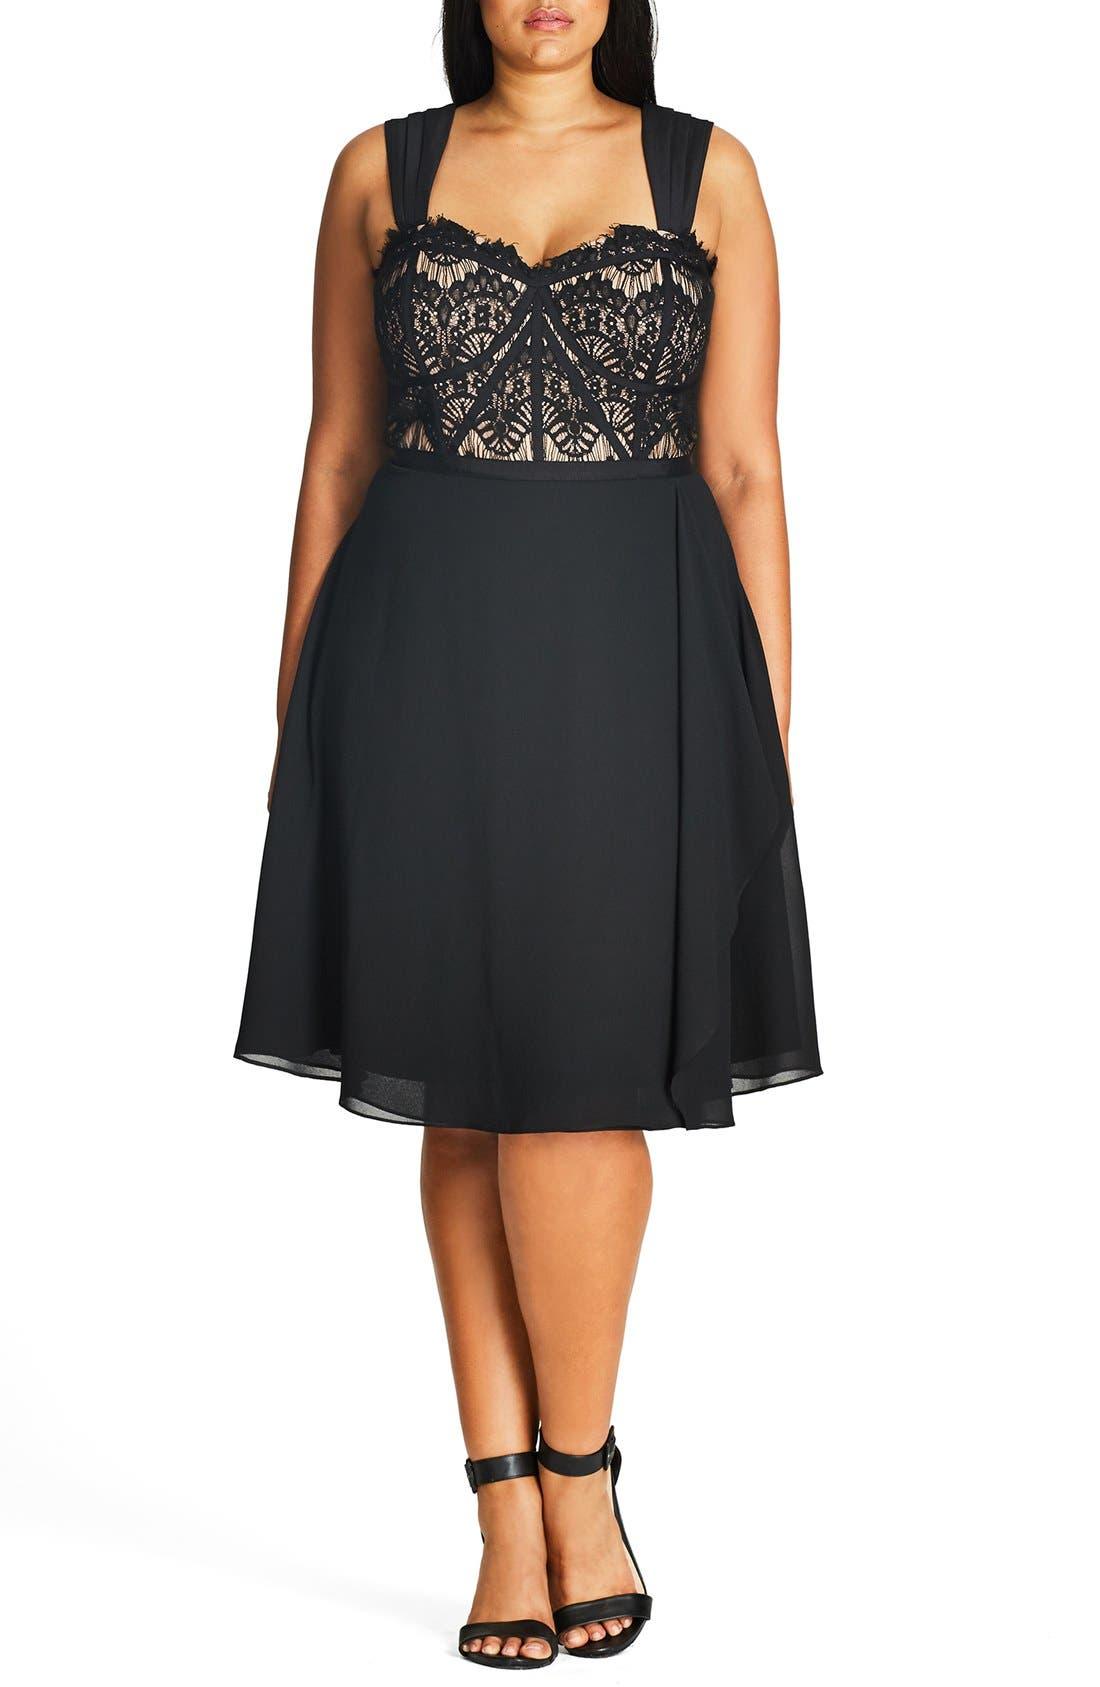 Main Image - City Chic 'Eyelash Evie' Lace & Chiffon Cocktail Dress (Plus Size)